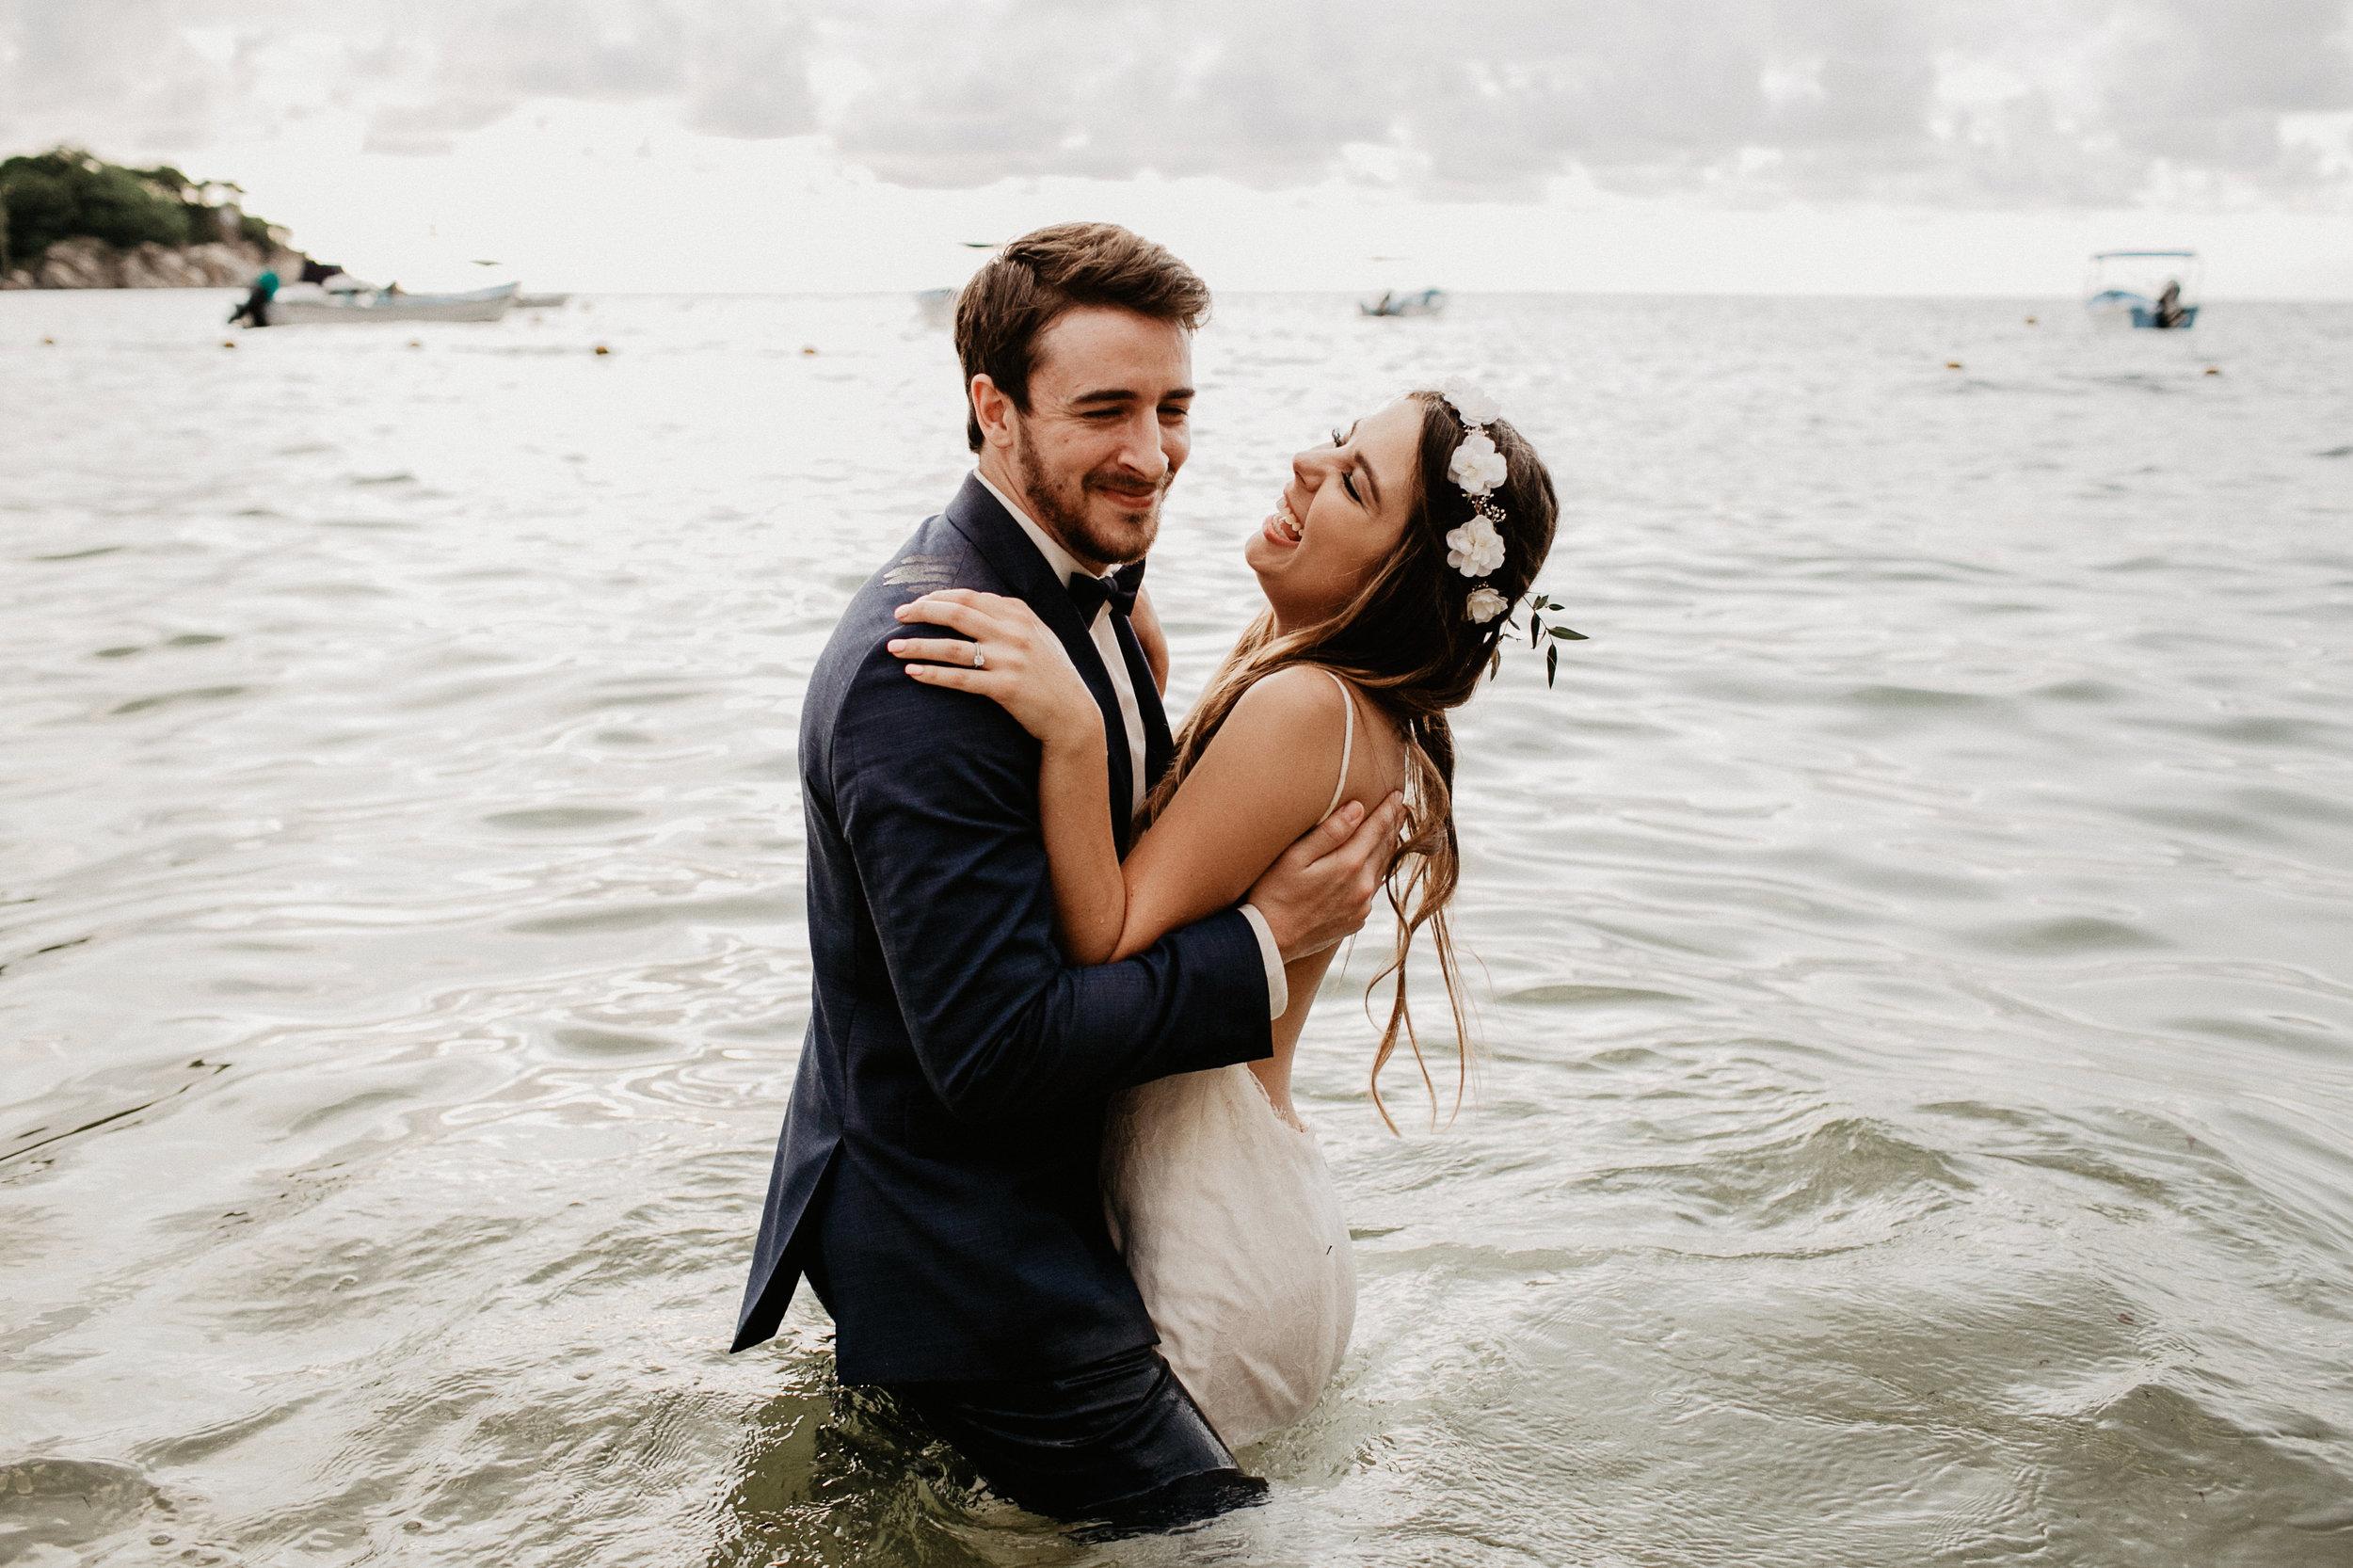 alfonso_flores_destination_wedding_photography_puerto_vallarta_hotel_barcelo_vallarta_cuttler_amela-772.JPG